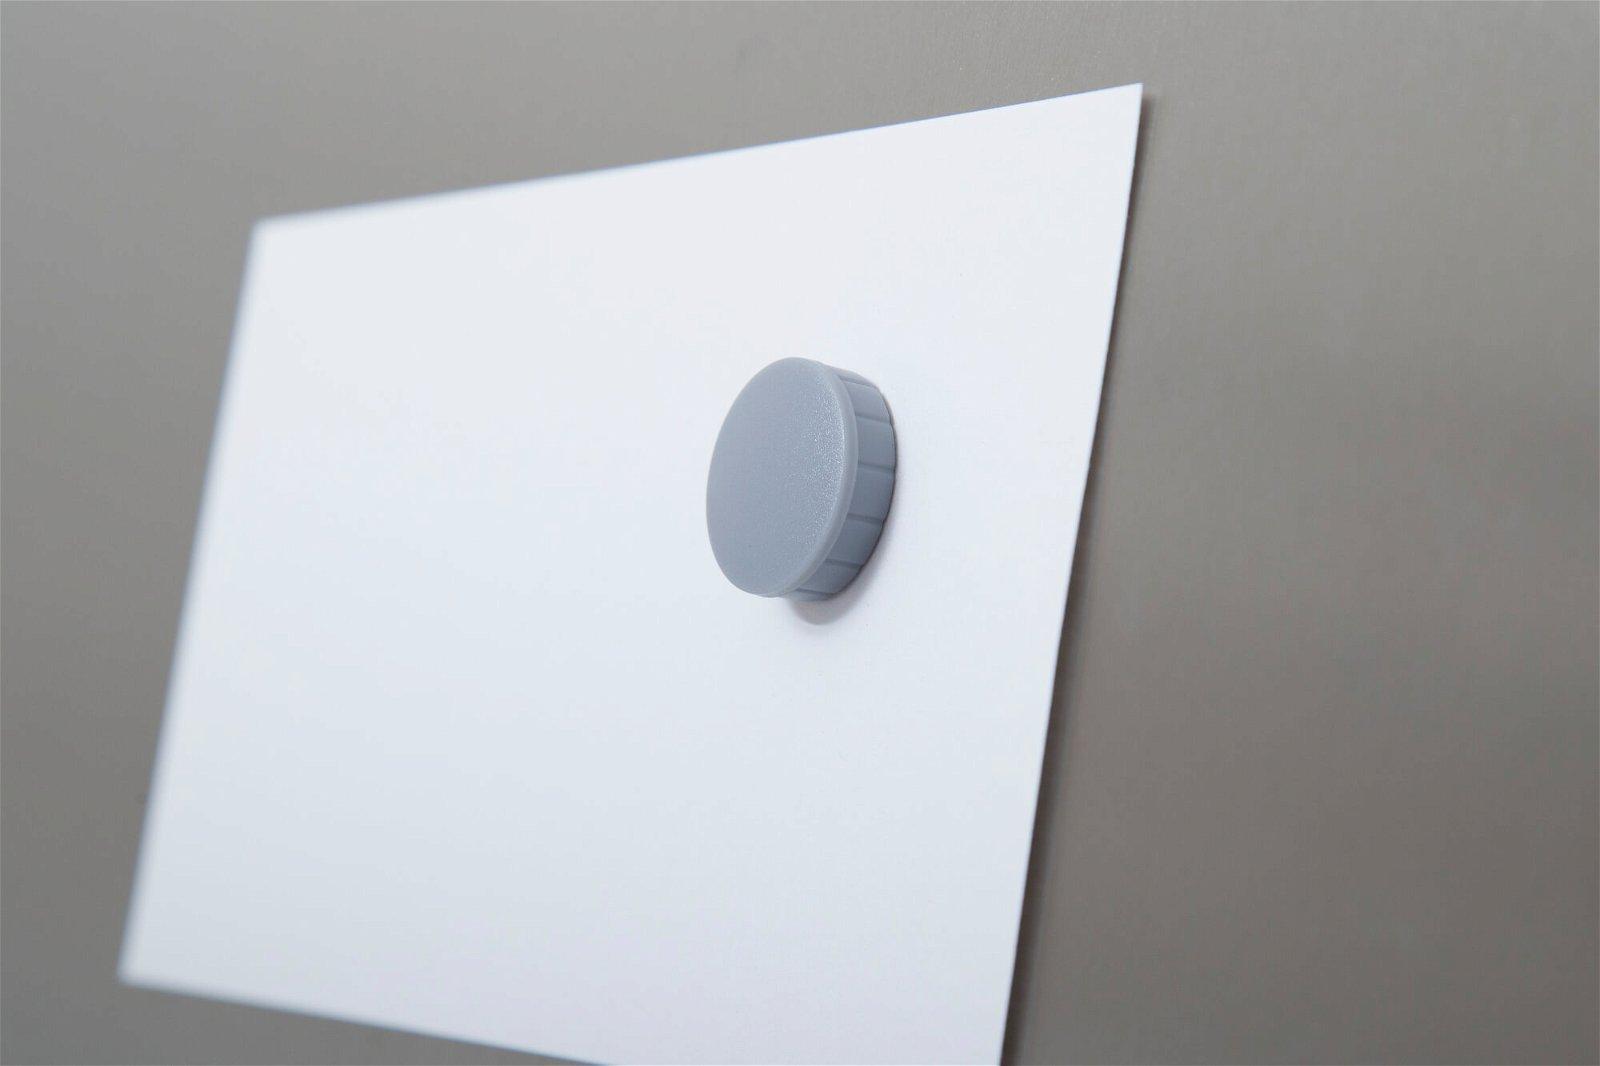 Magnet MAULsolid Ø 24 mm, 0,6 kg Haftkraft, 10 St./Ktn., grau